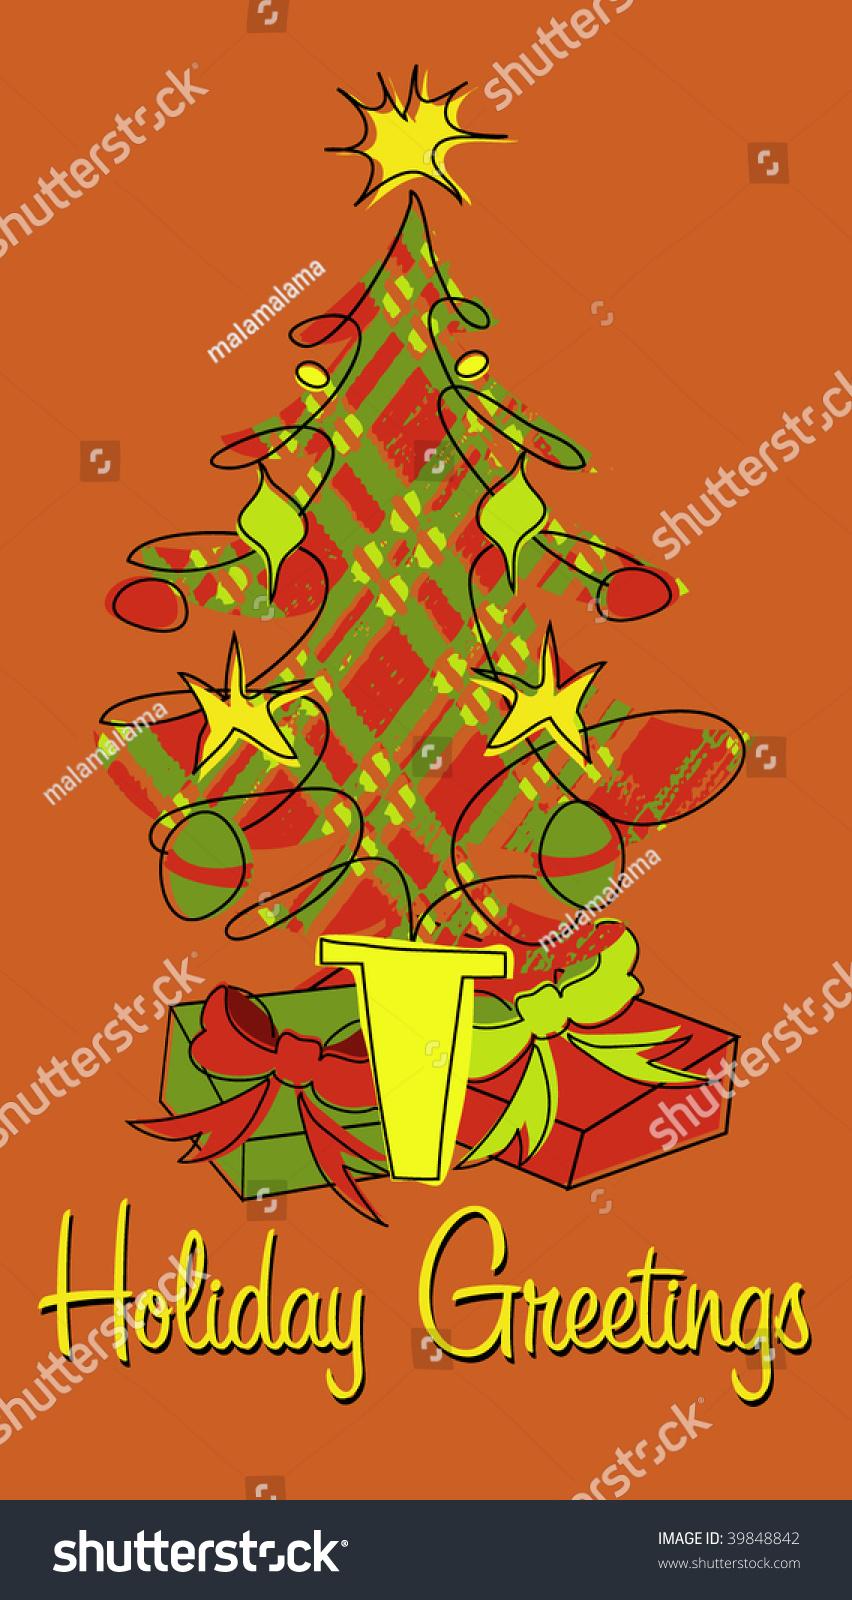 Plaid Christmas Tree Holiday Greeting Stock Vector 39848842